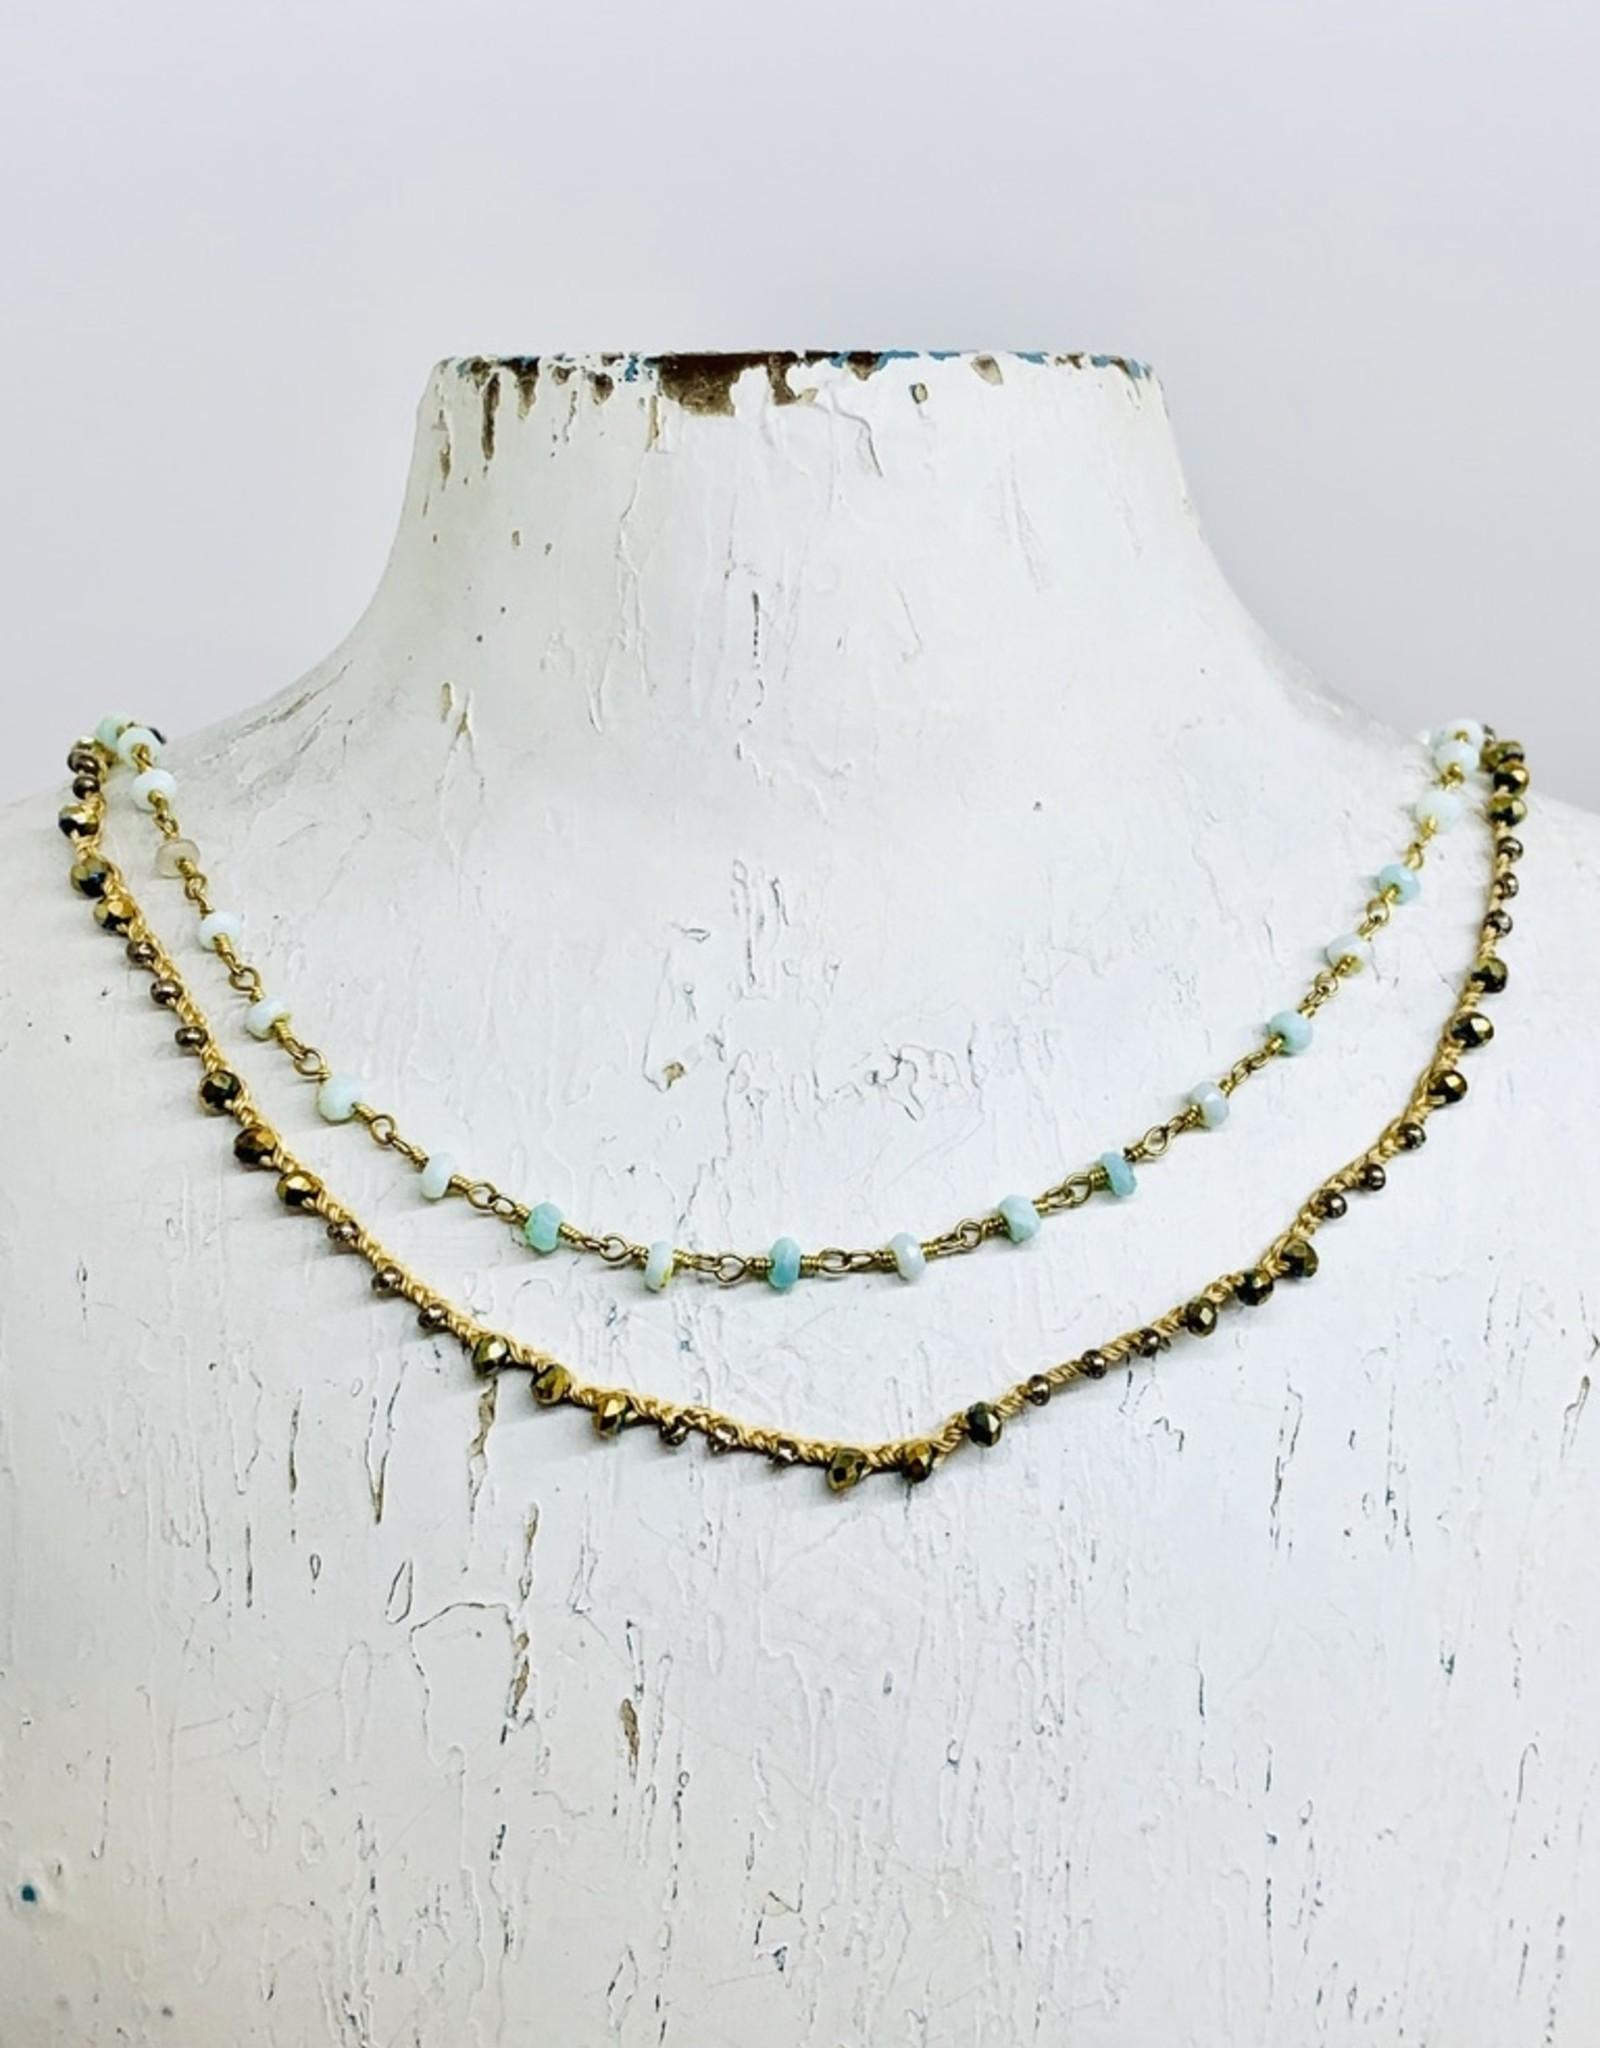 Native Gems RITUAL peruvian opal necklace   Double strands of 14k gold vermeil, silk, cz